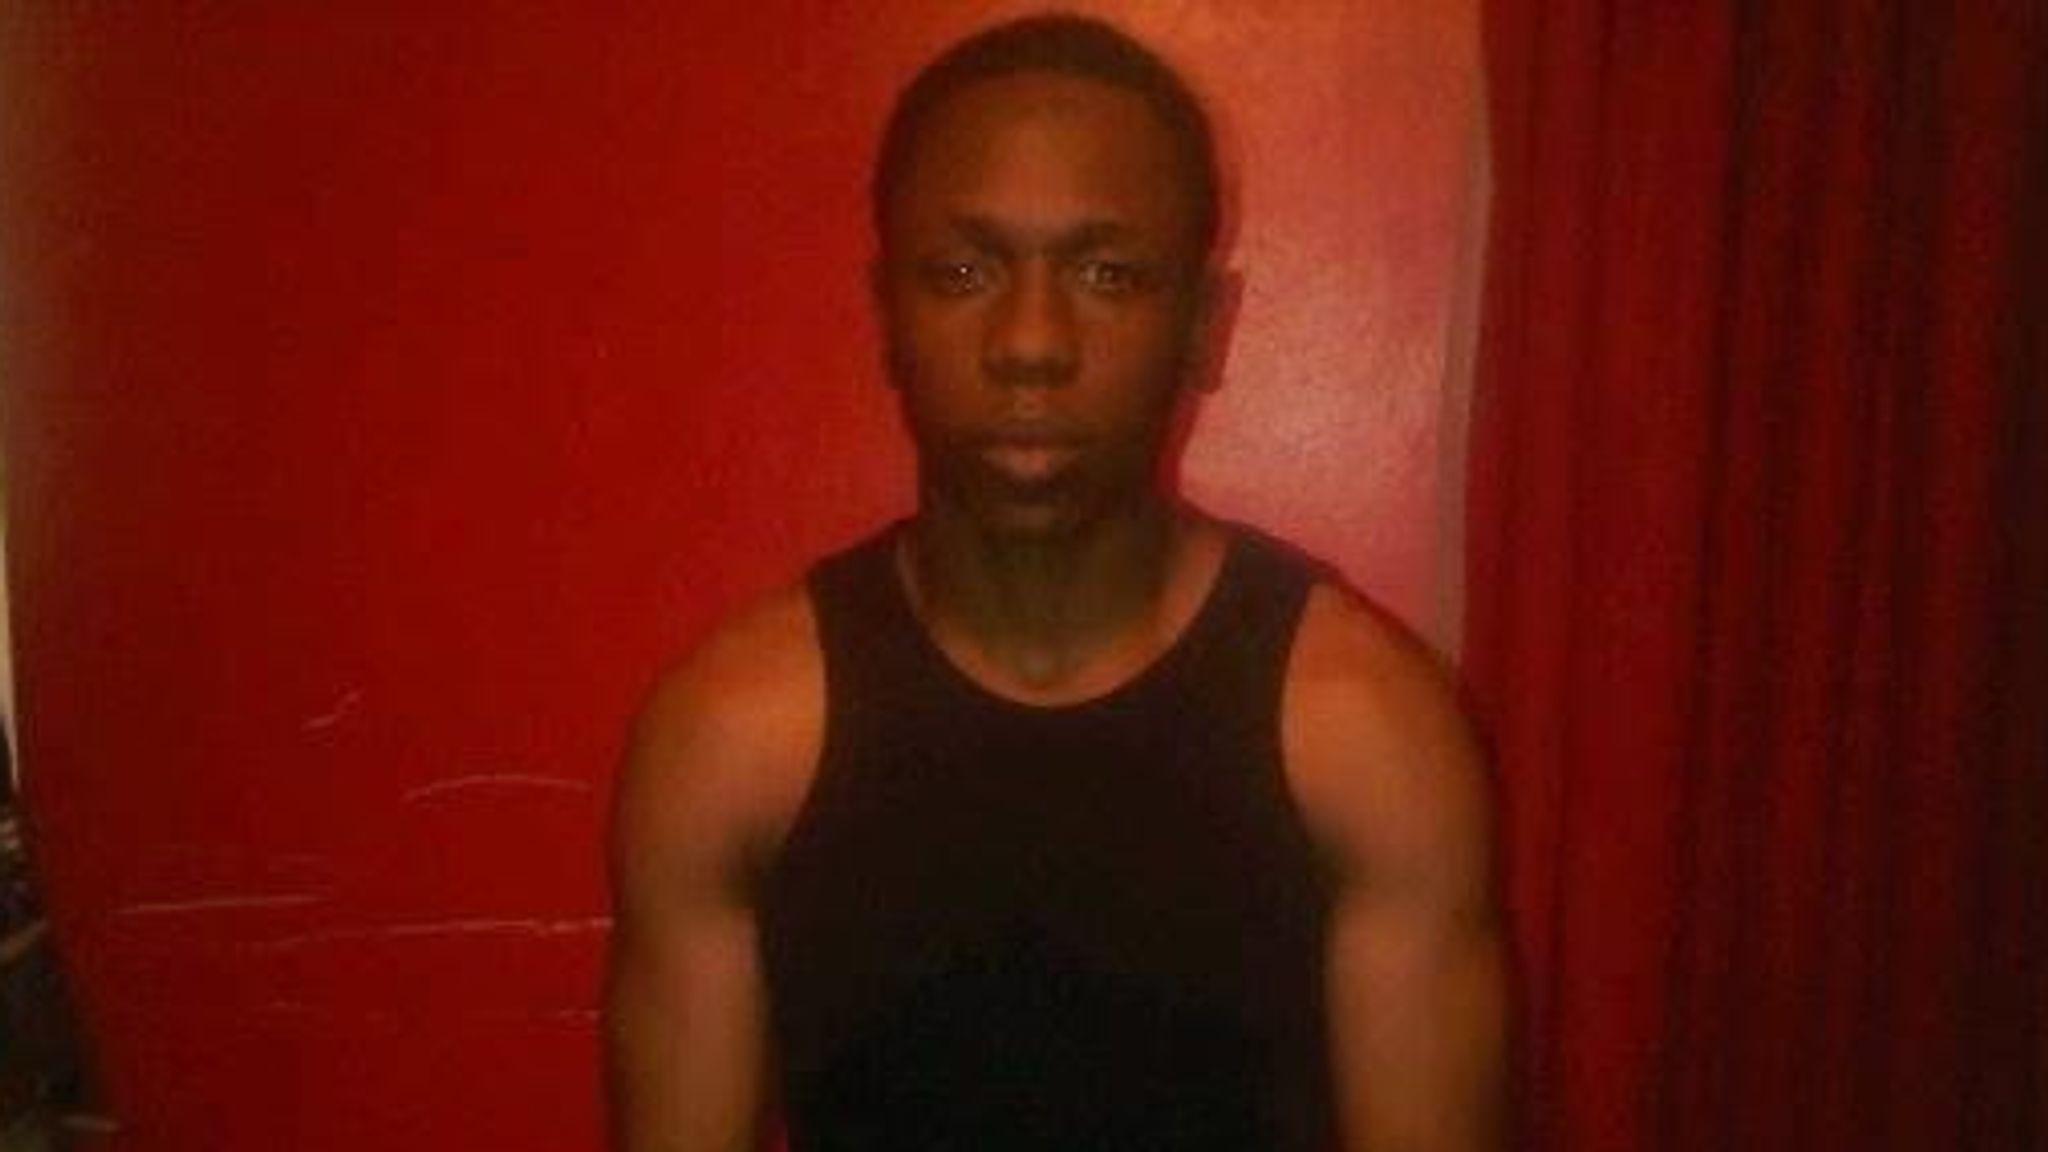 Birmingham stabbings: Zephaniah McLeod charged with murder of Jacob Billington | UK News | Sky News